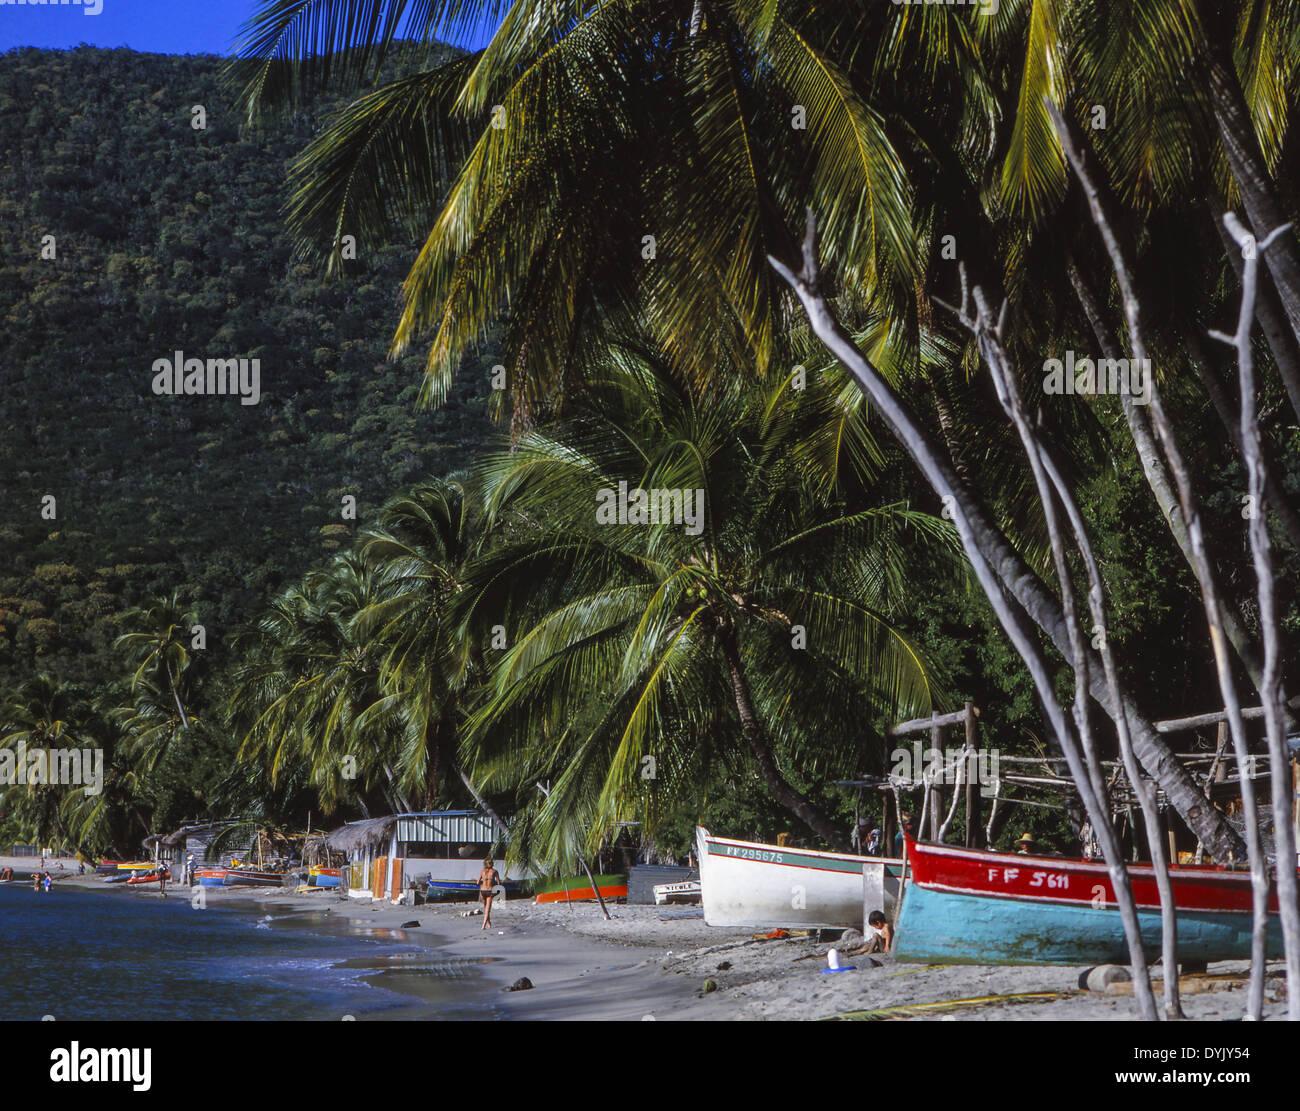 Karibik, Palmenstrand Auf der Insel Martinique Stockbild